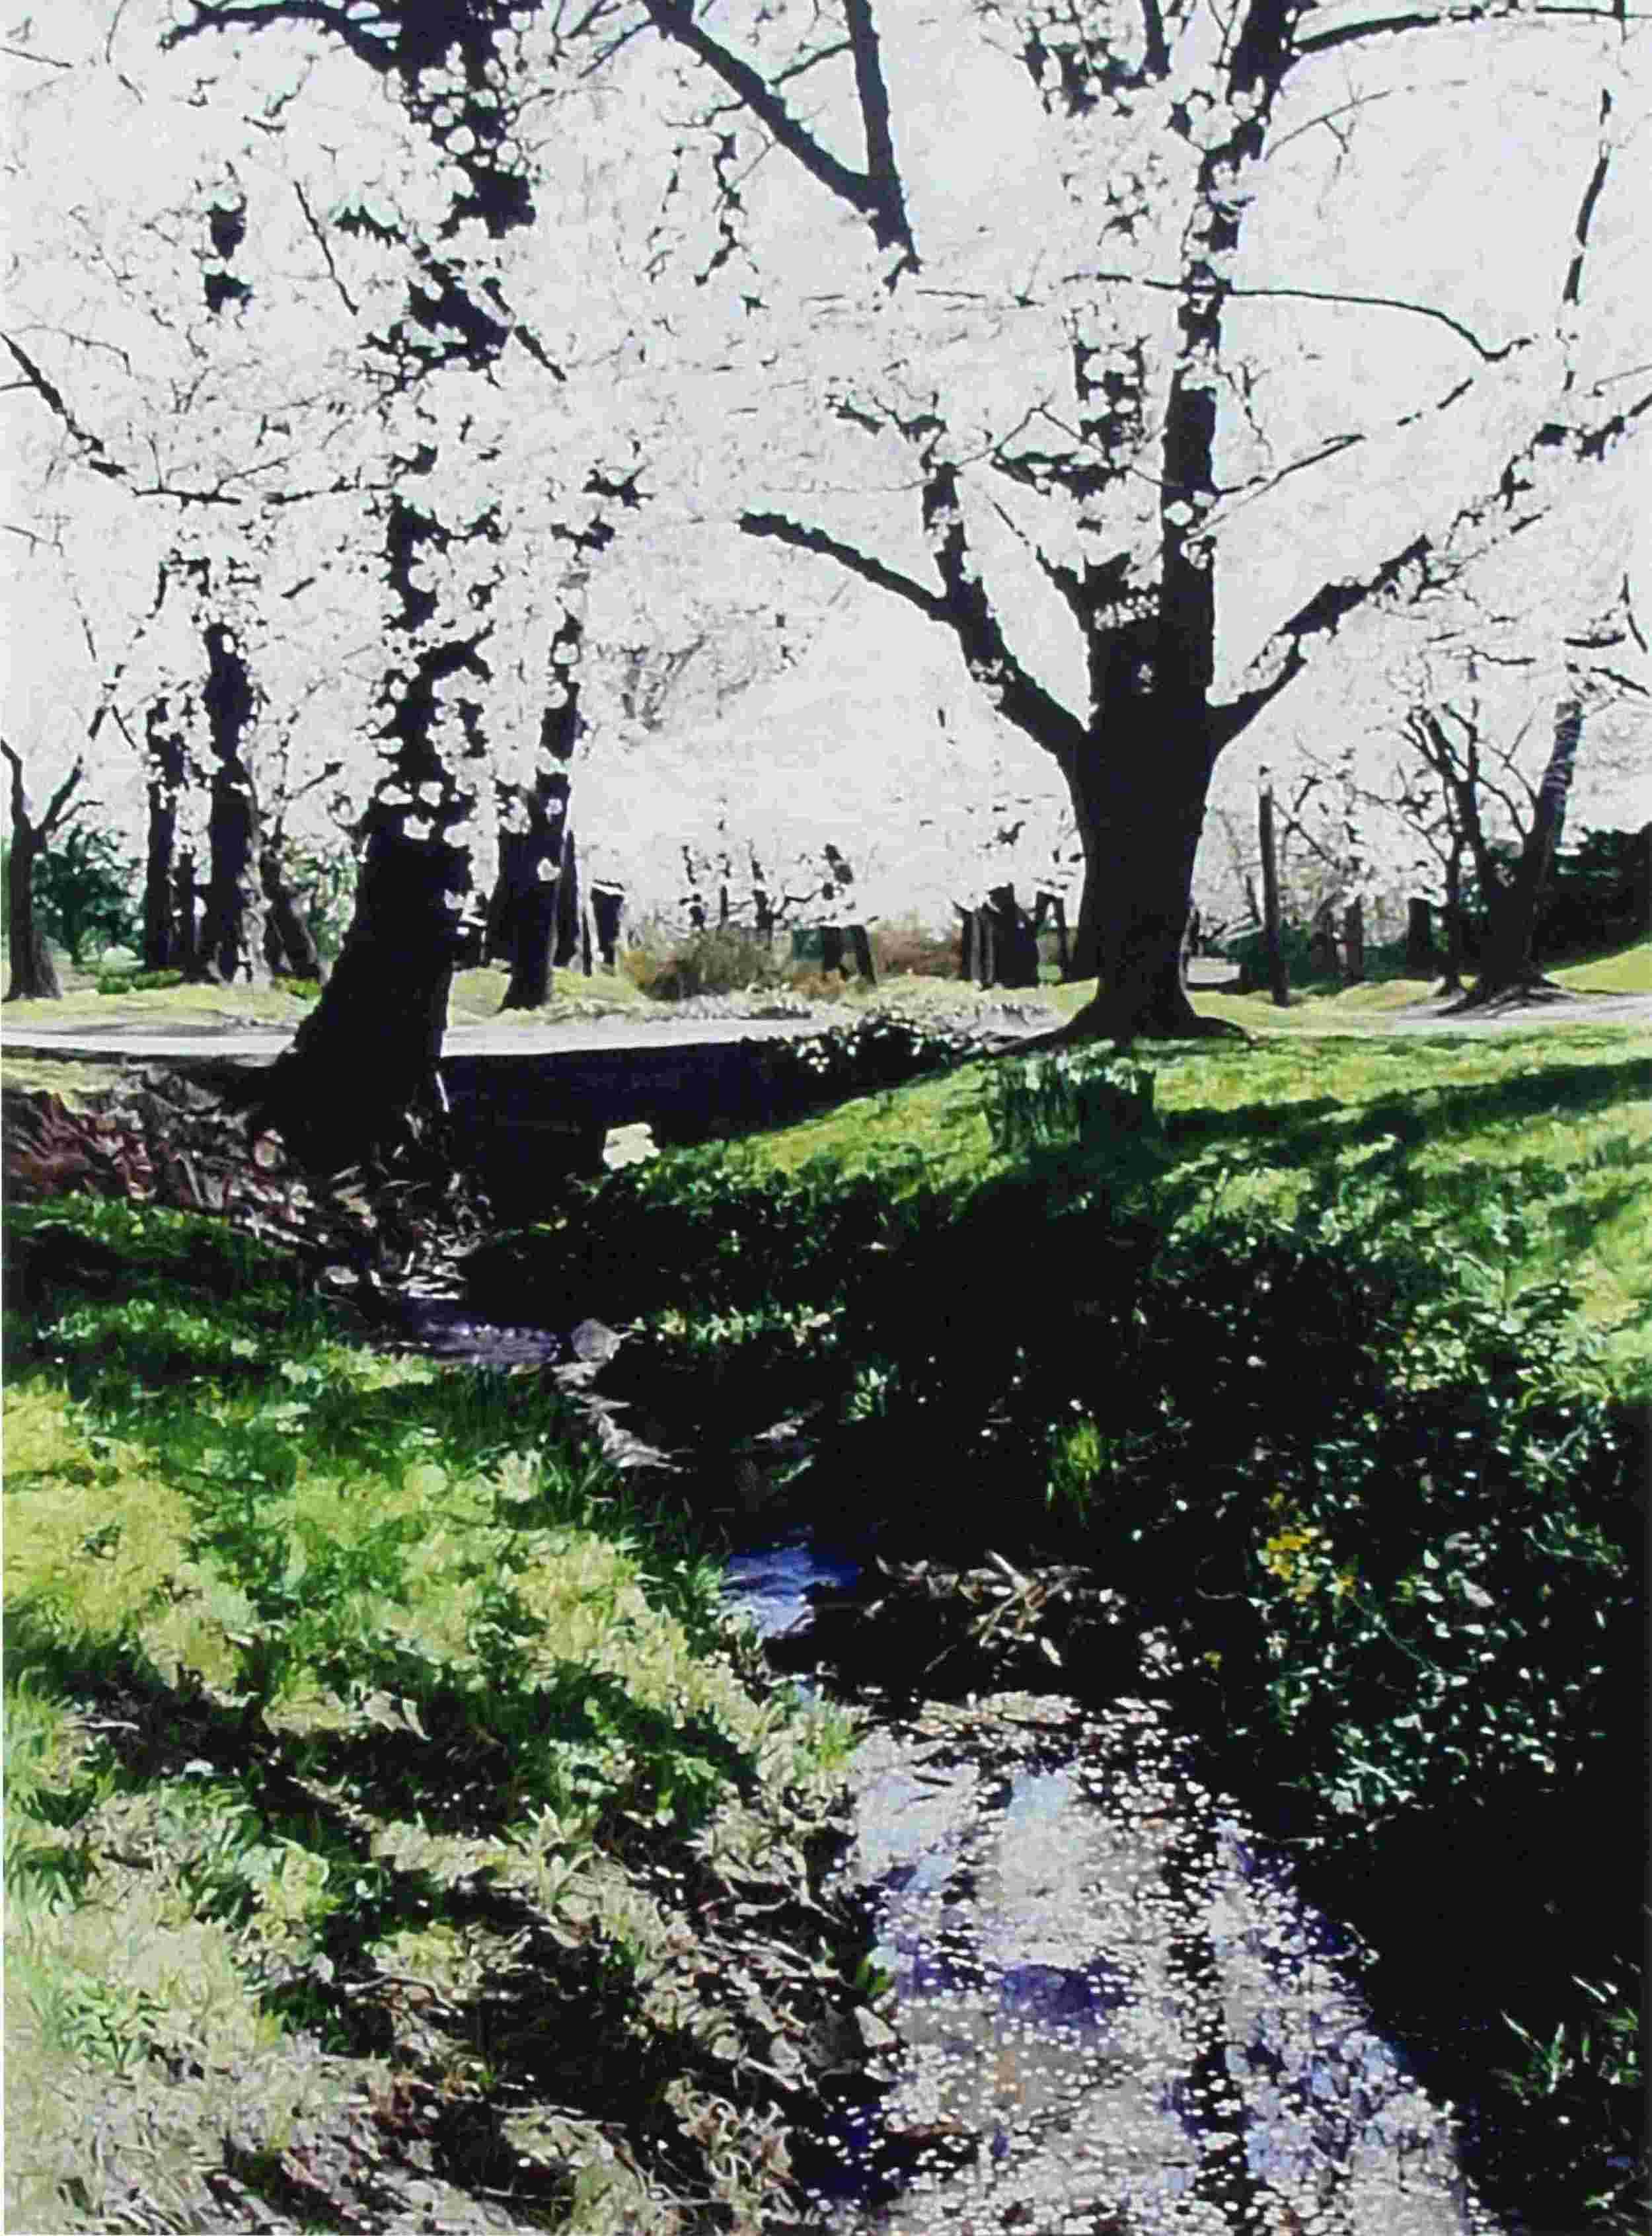 Petal Creek, 6'x4', oil on canvas